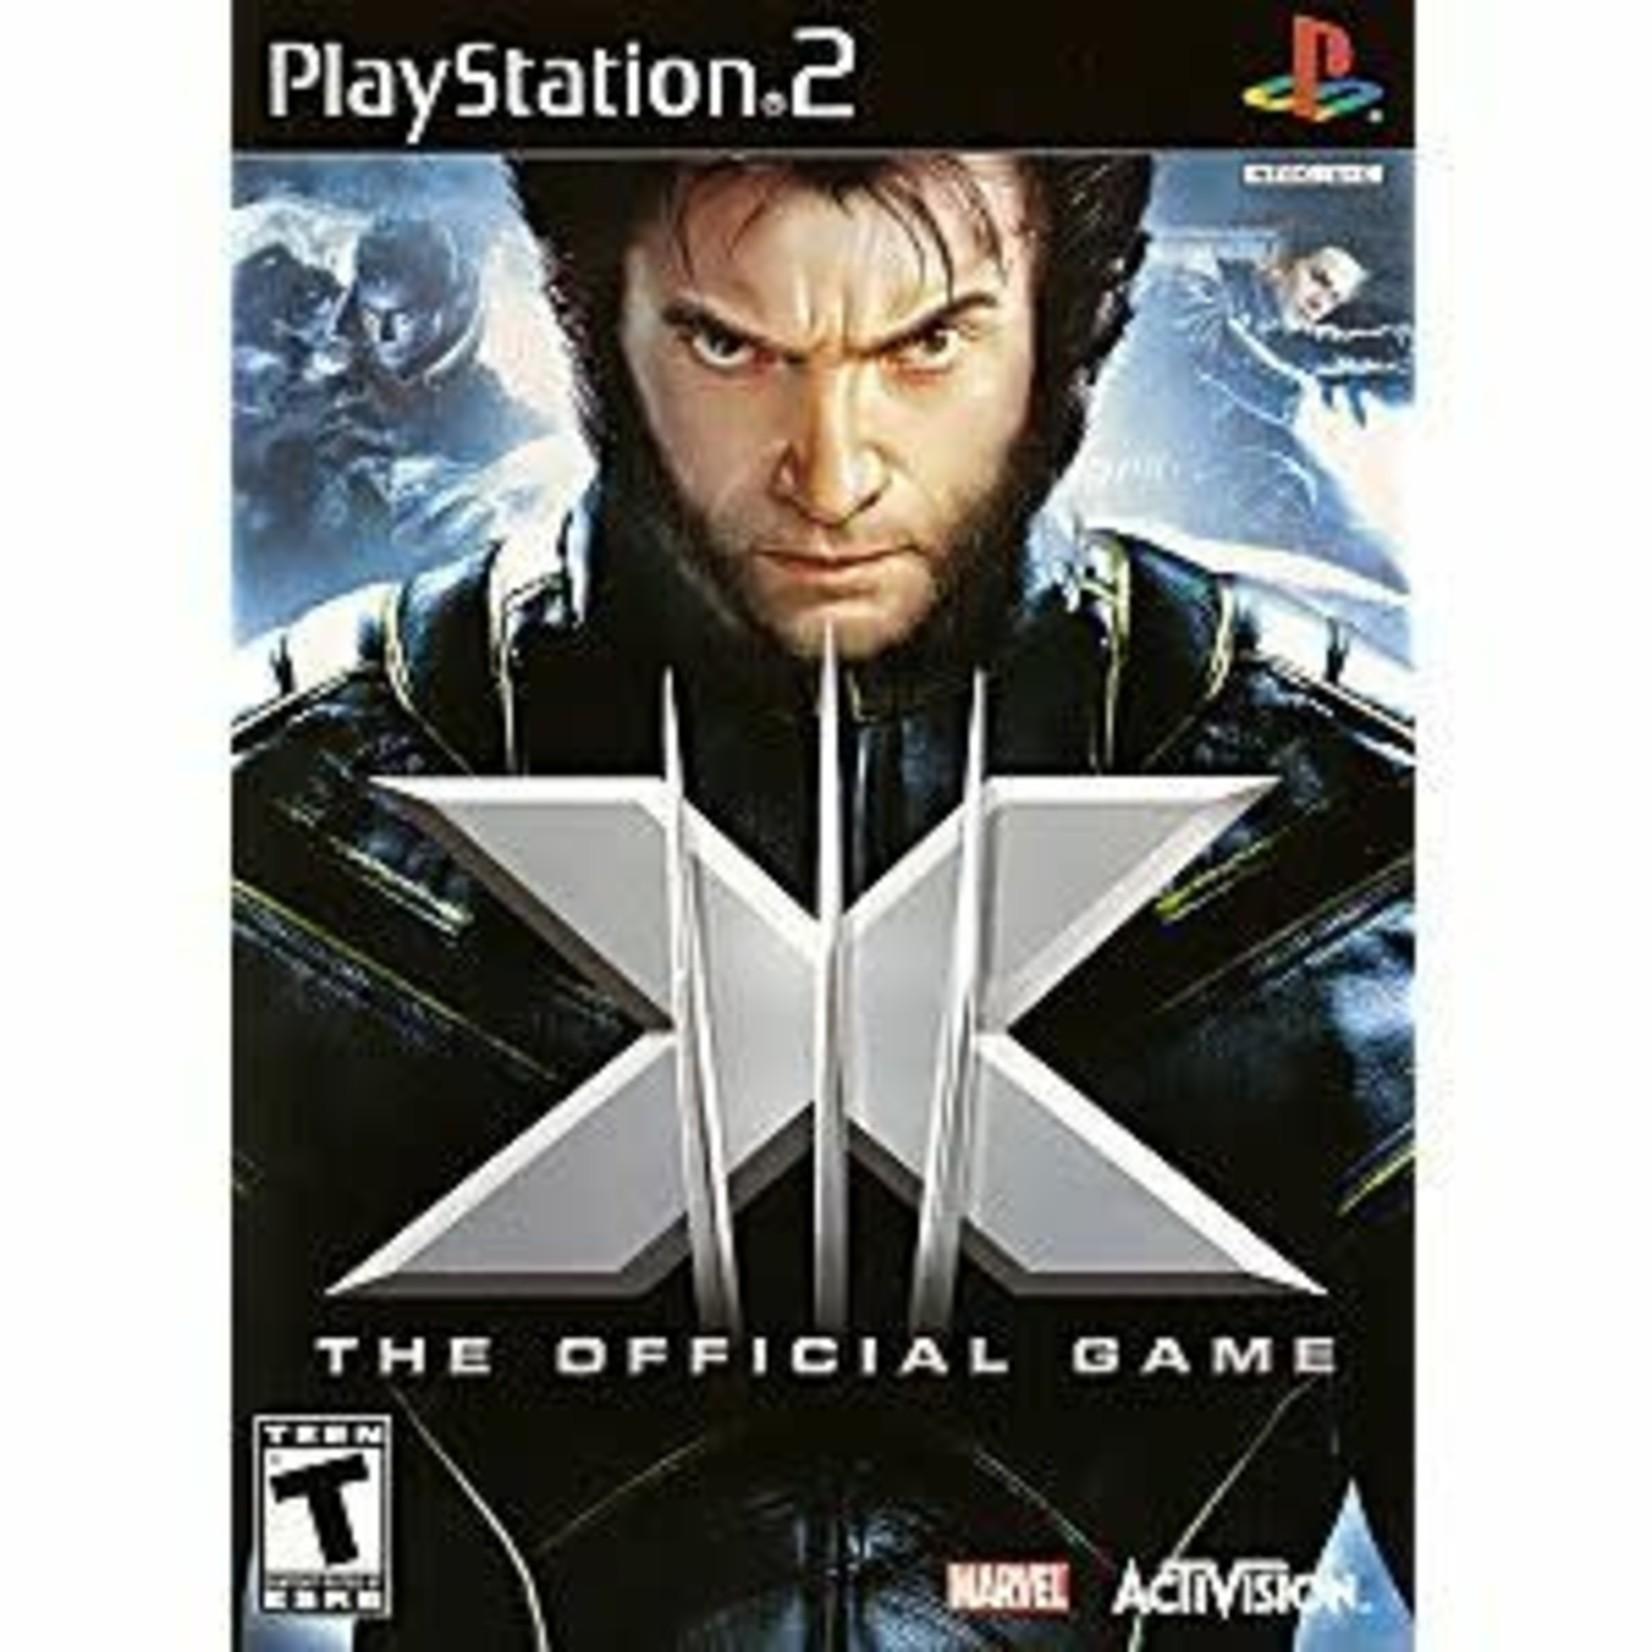 PS2U-XMEN OFFICIAL GAME